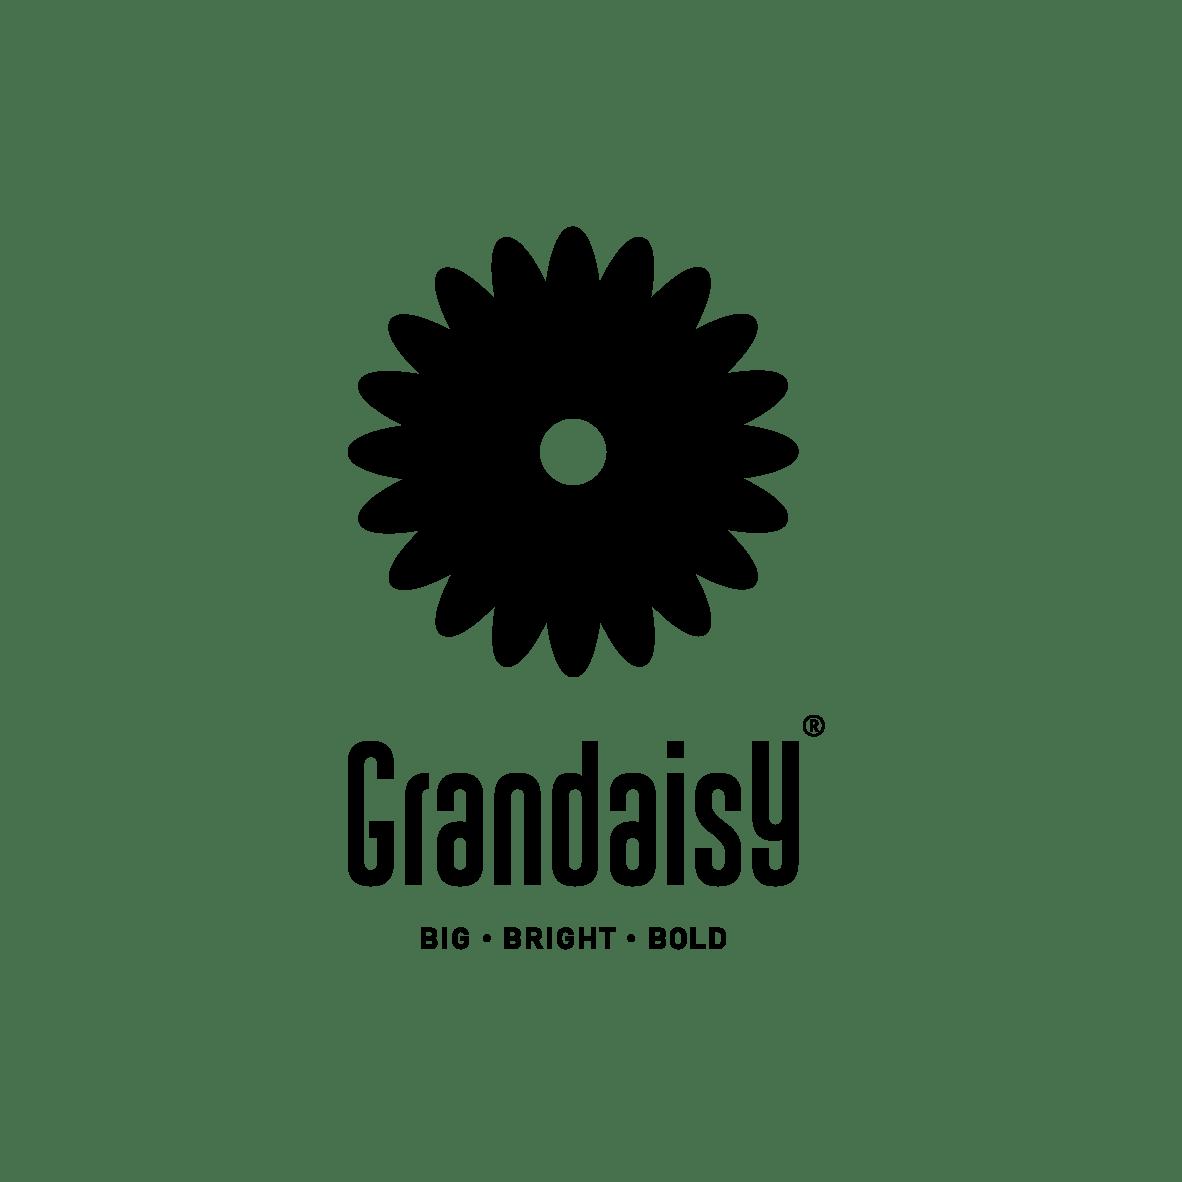 Grandaisy logo black